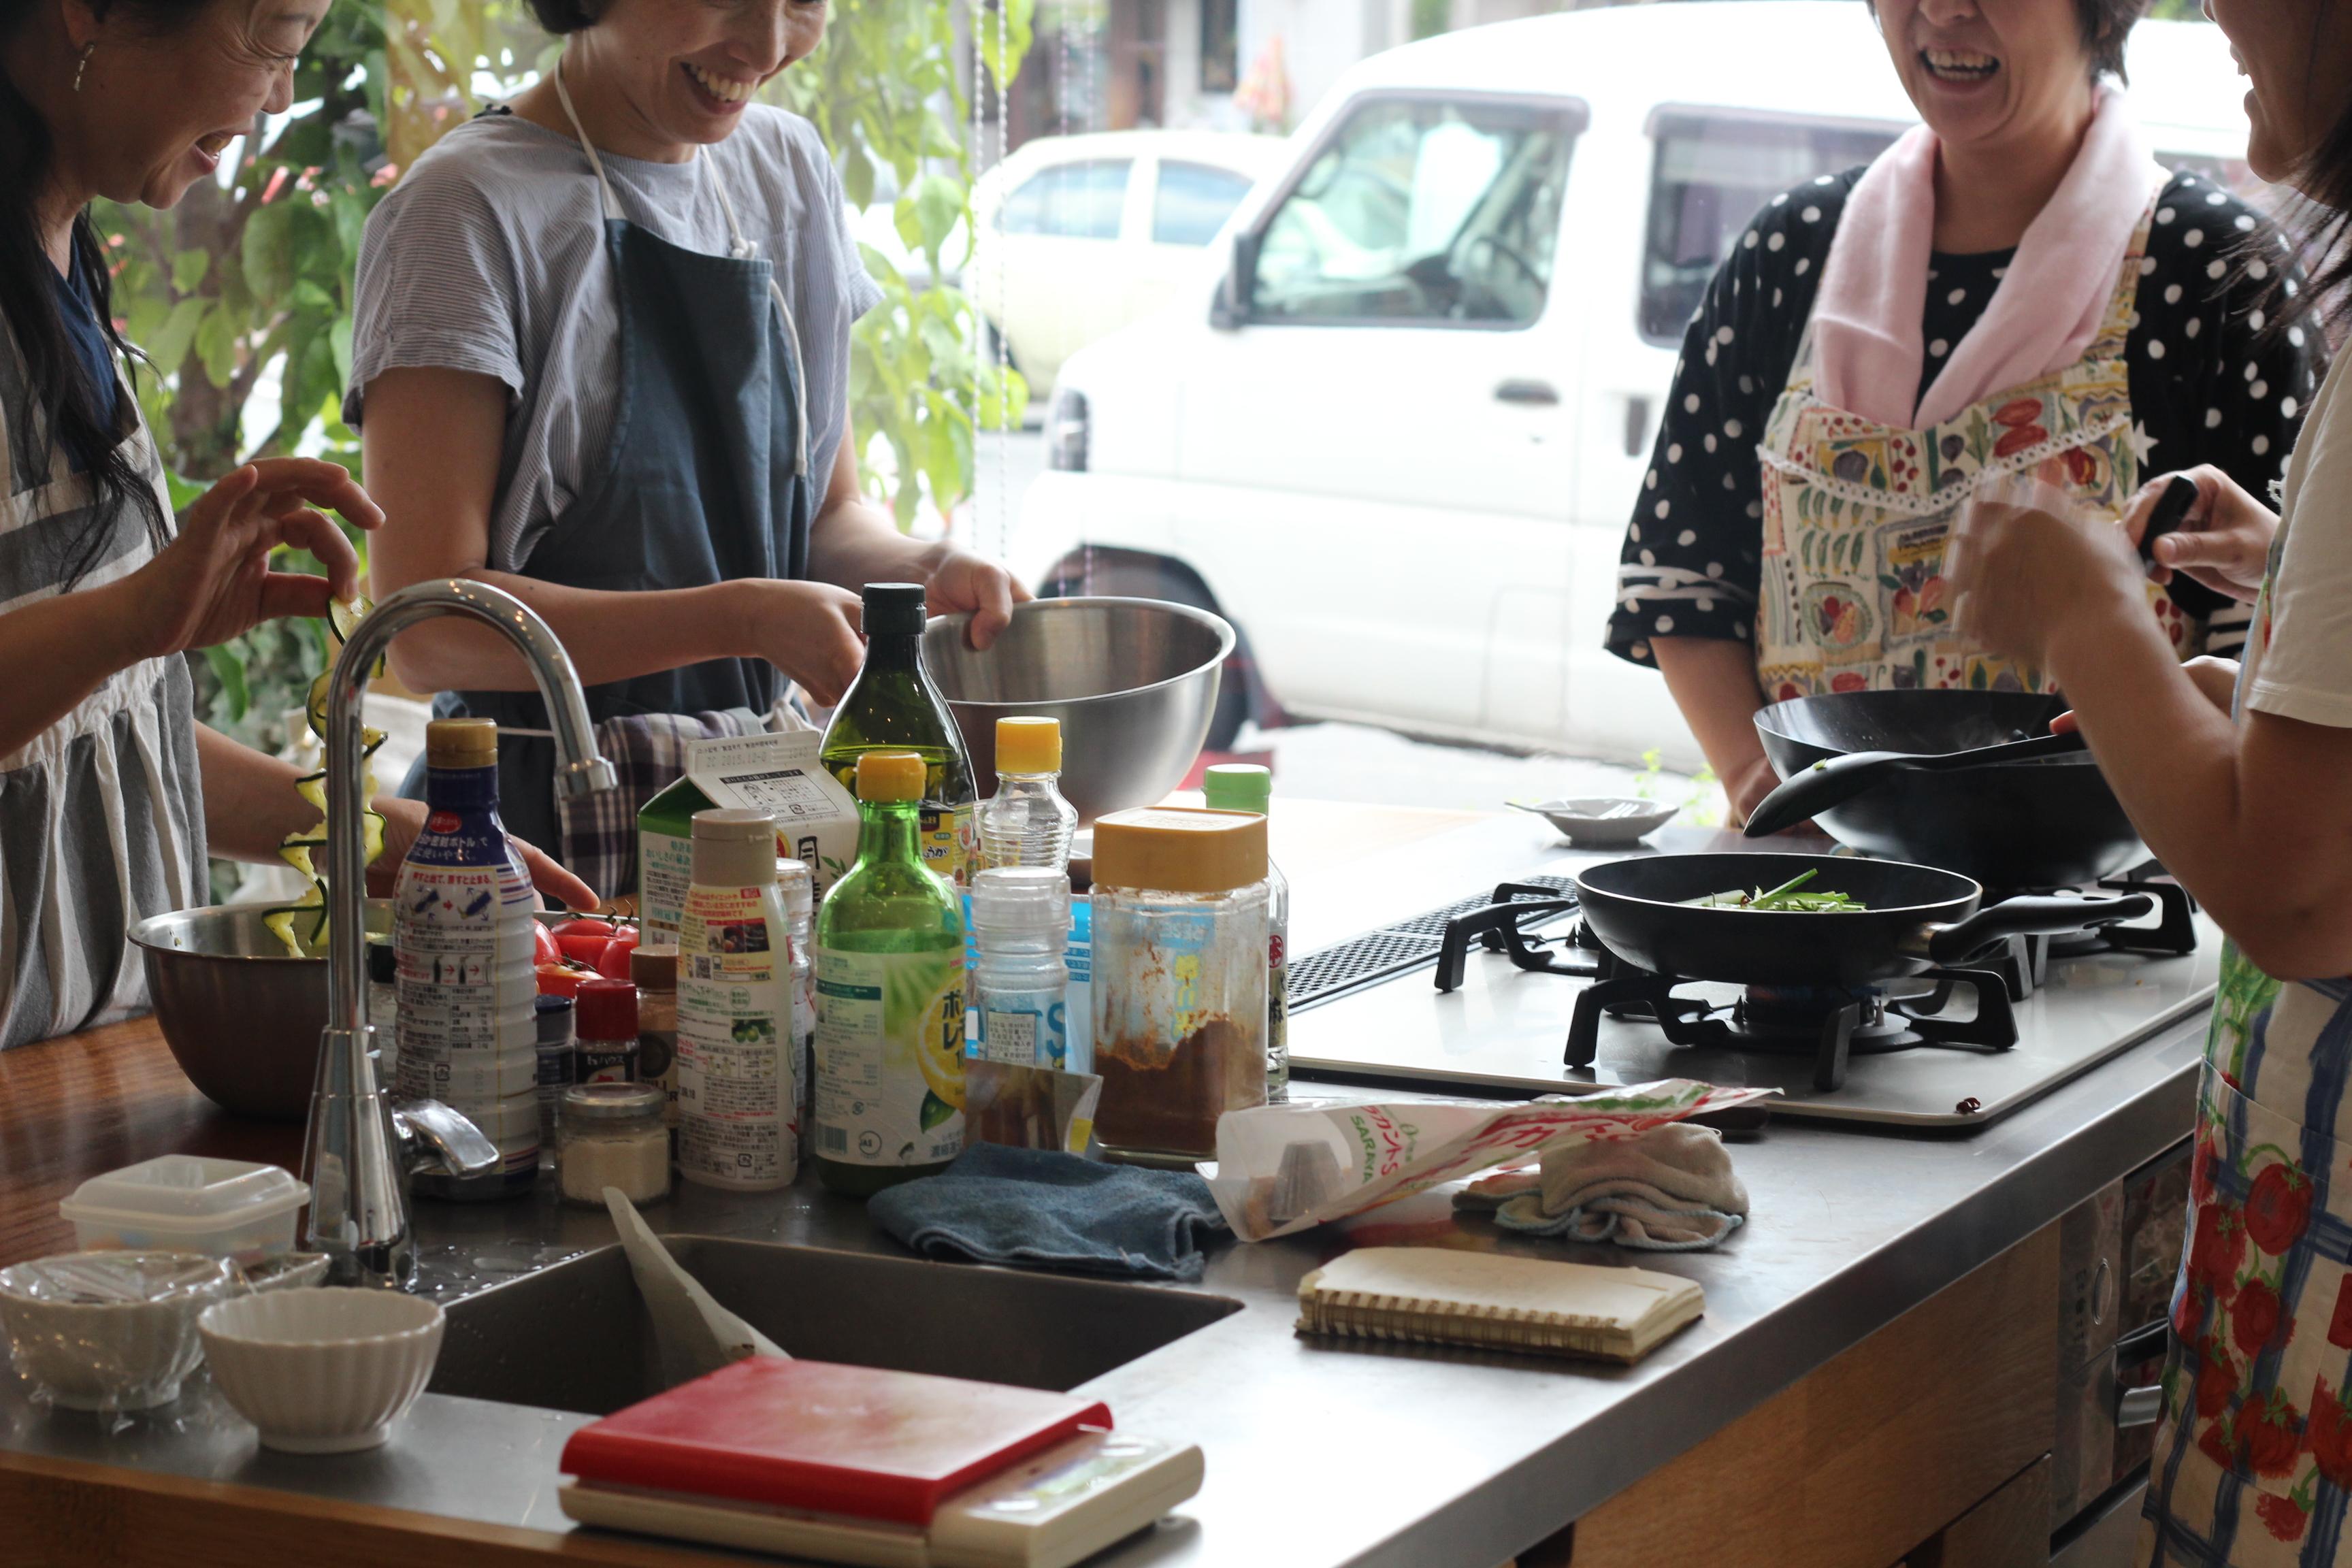 a-ta-sante糖質制限パン料理教室。大阪市阿倍野区。おしゃれで楽しい低糖質料理教室8月最終日。テーマは、『夏野菜』